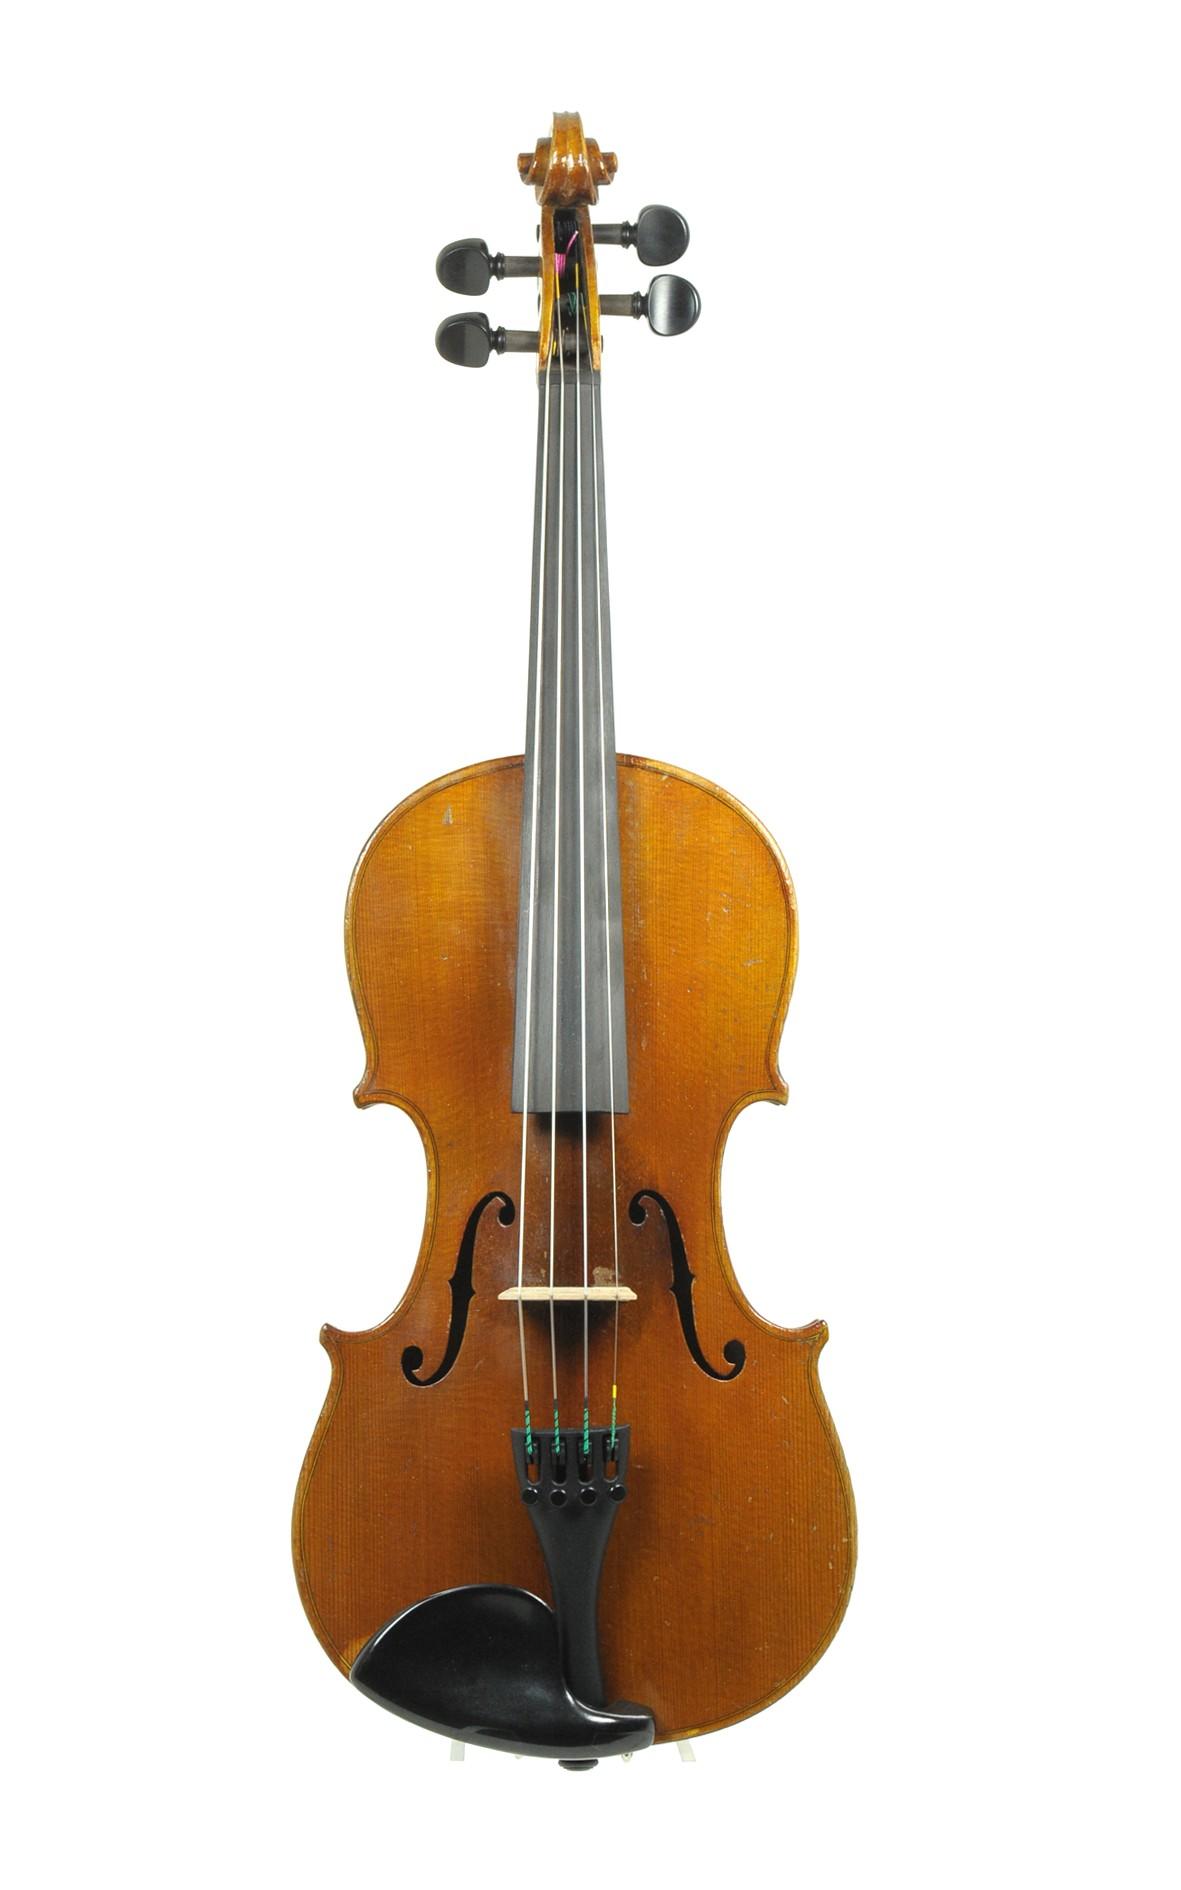 3/4 violin, Saxony-Bohemia, c1920